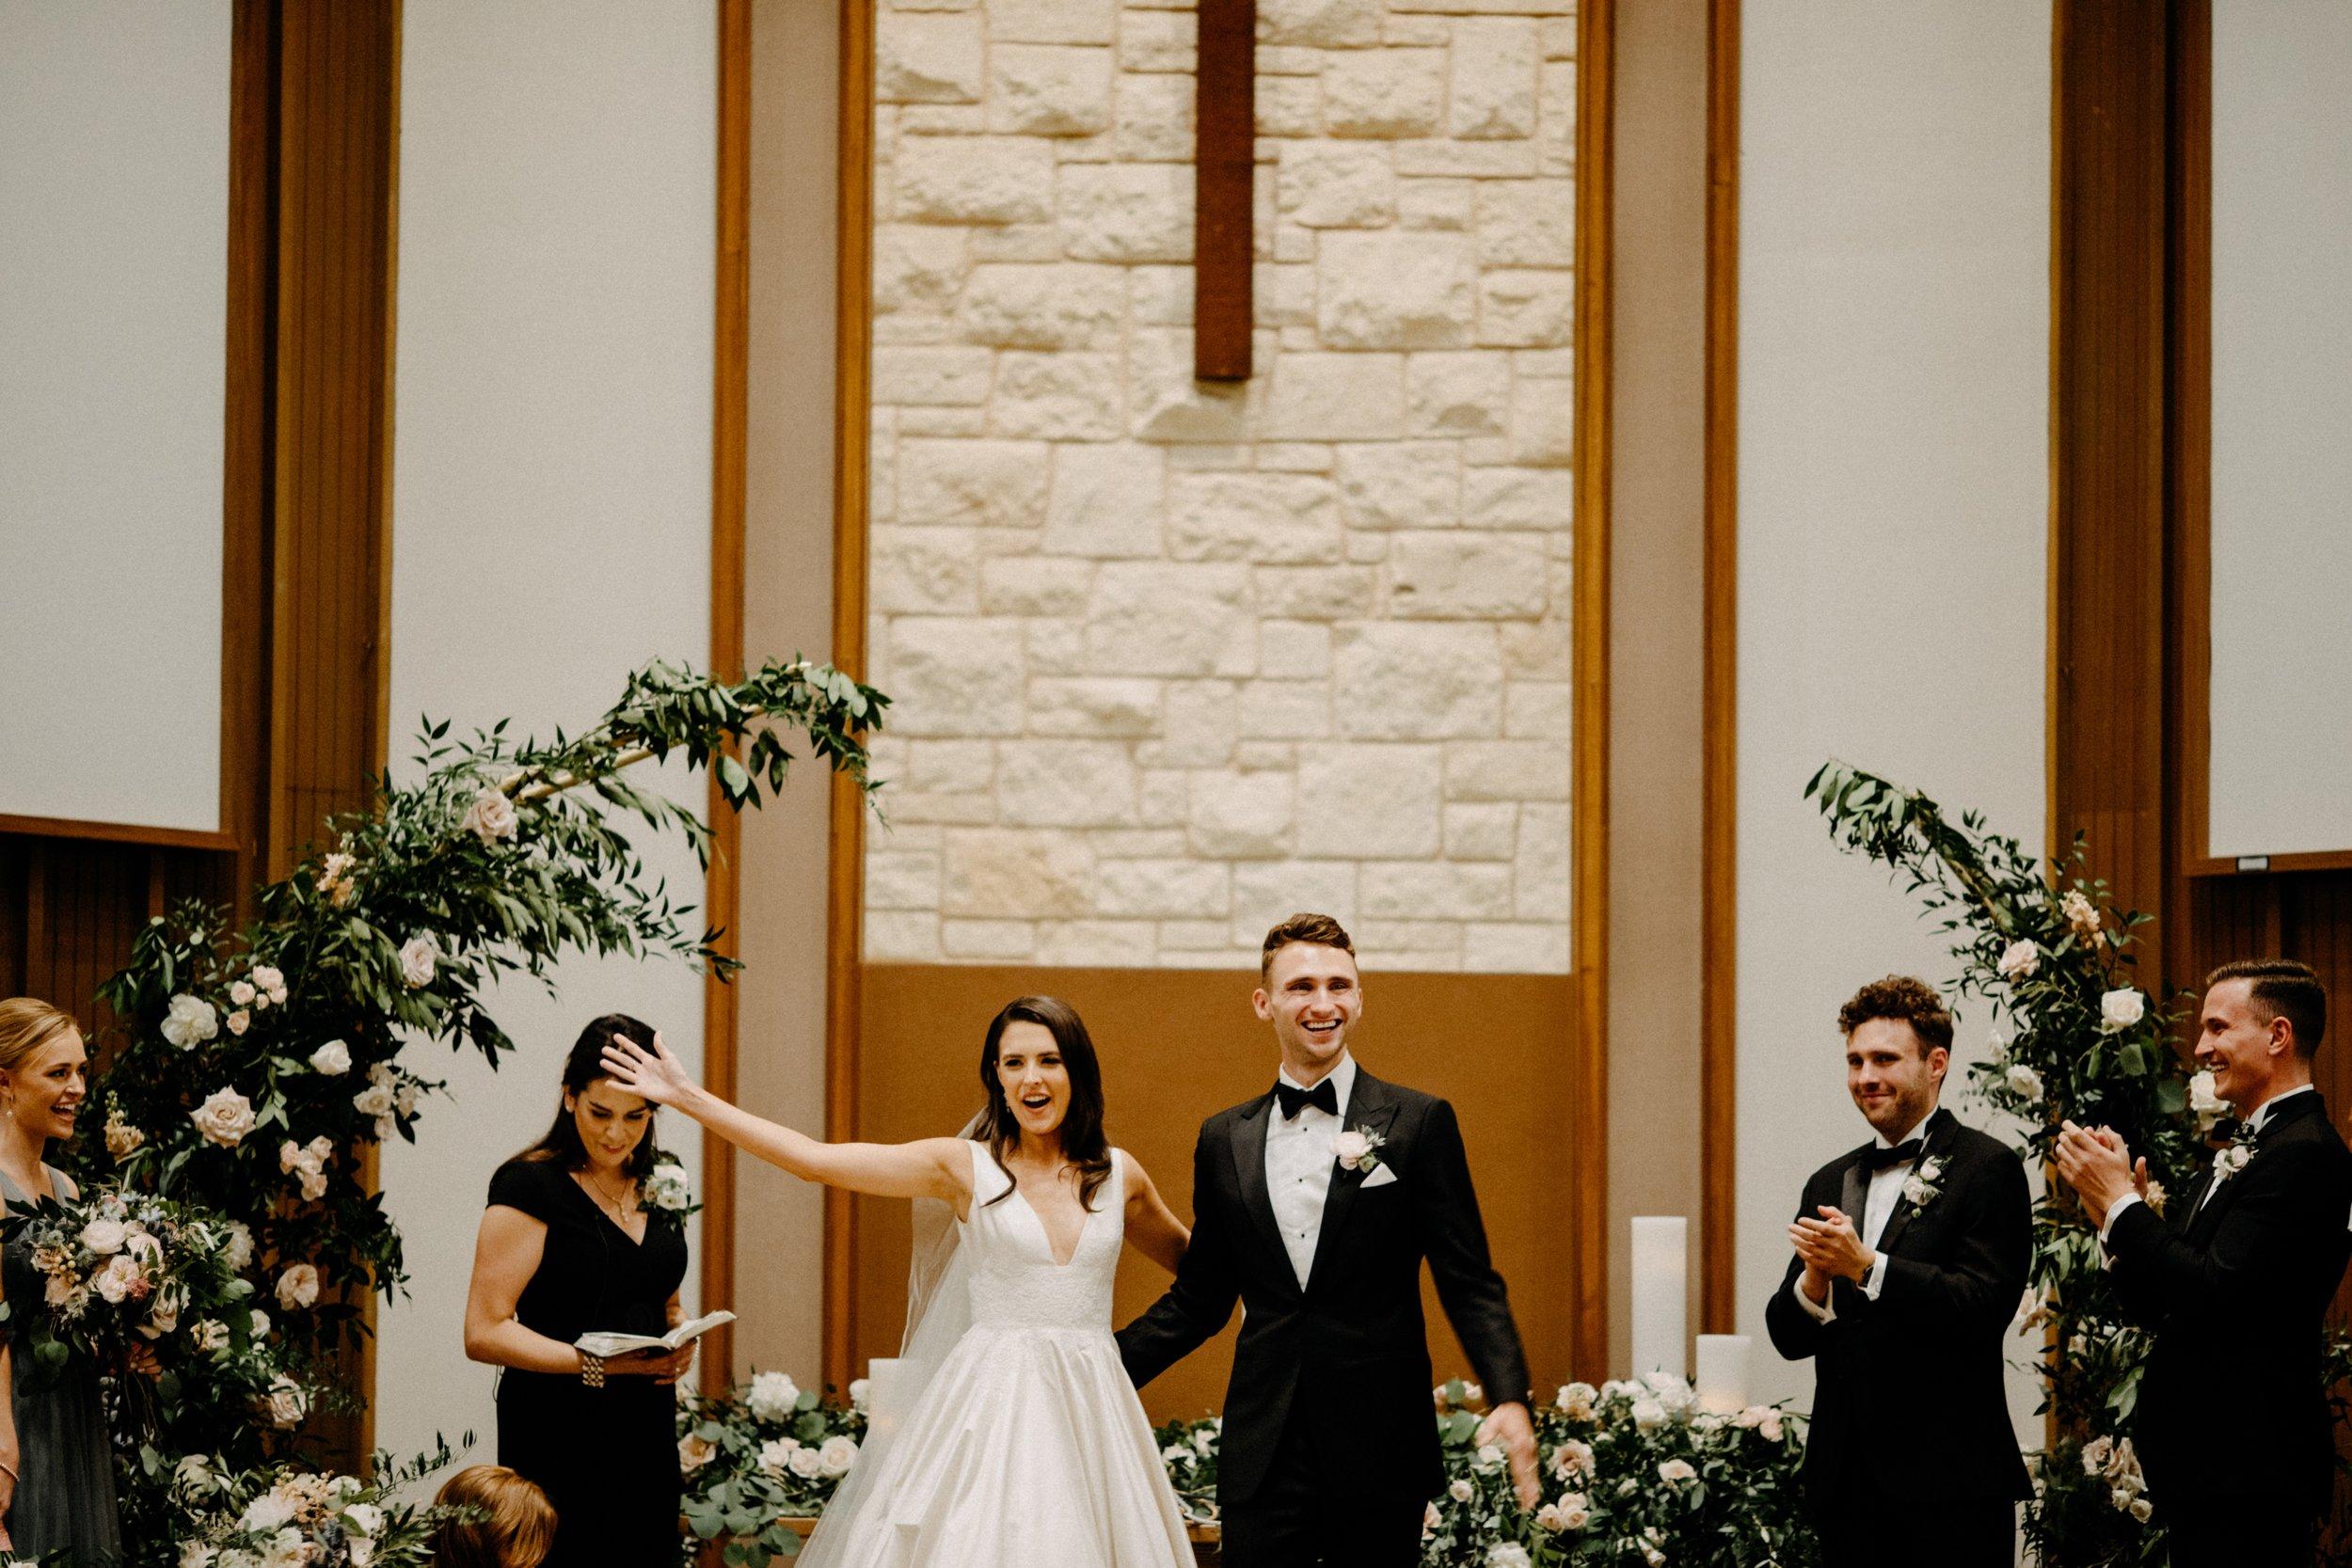 st-anthony-hotel-wedding-photography-10085san-antonio.JPG